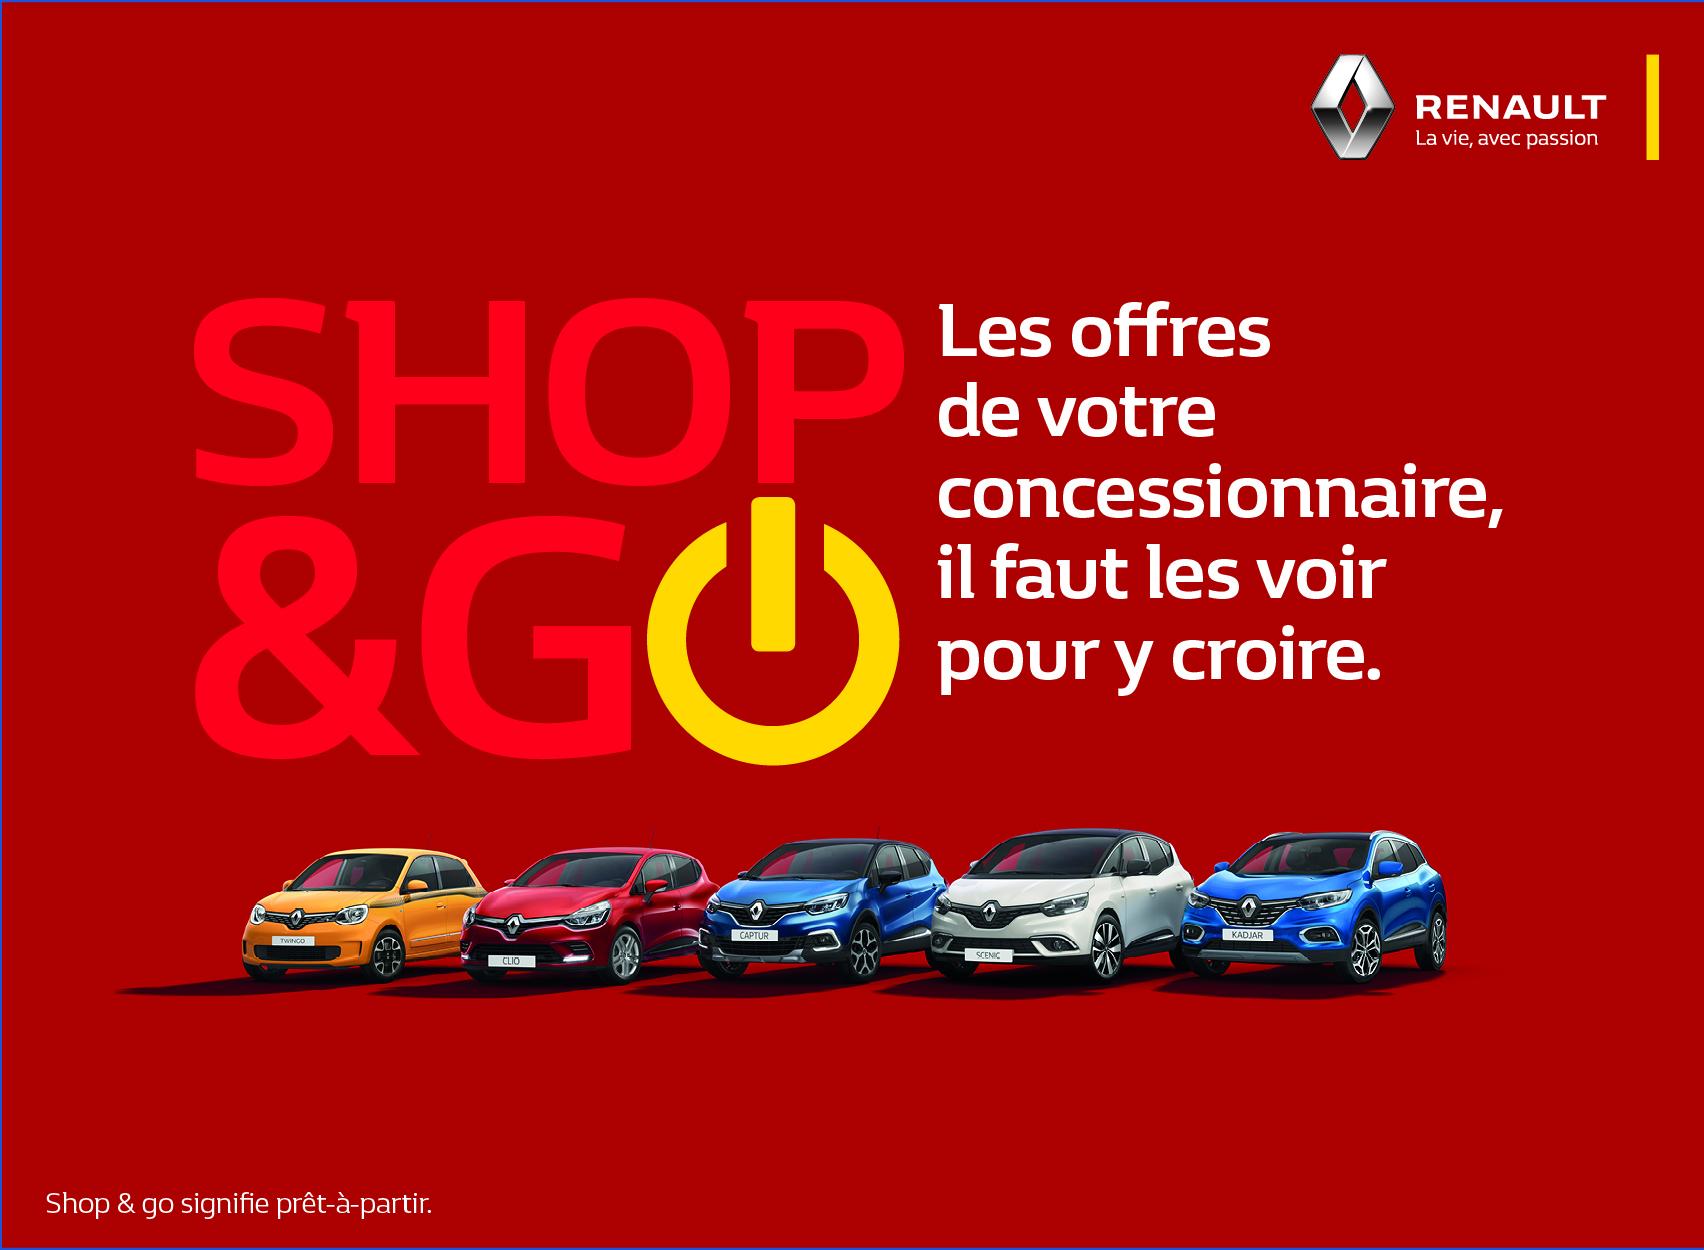 Offres Renault : Offres Shop & Go